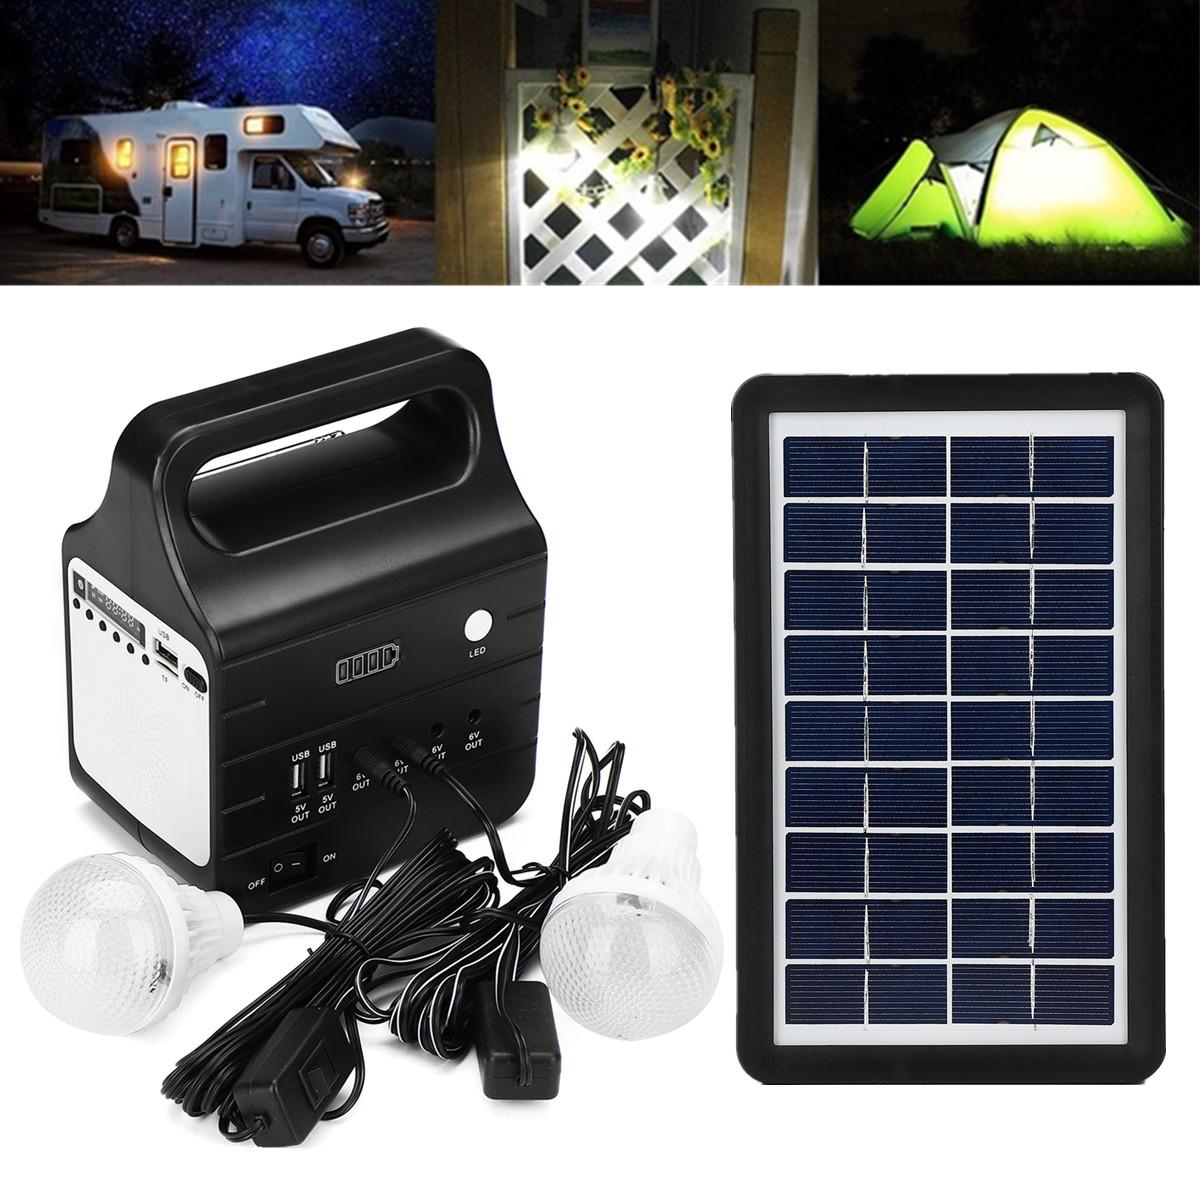 Solar Powered System Generator Energy Portable Home Solar Energy Power Generation Lighting System